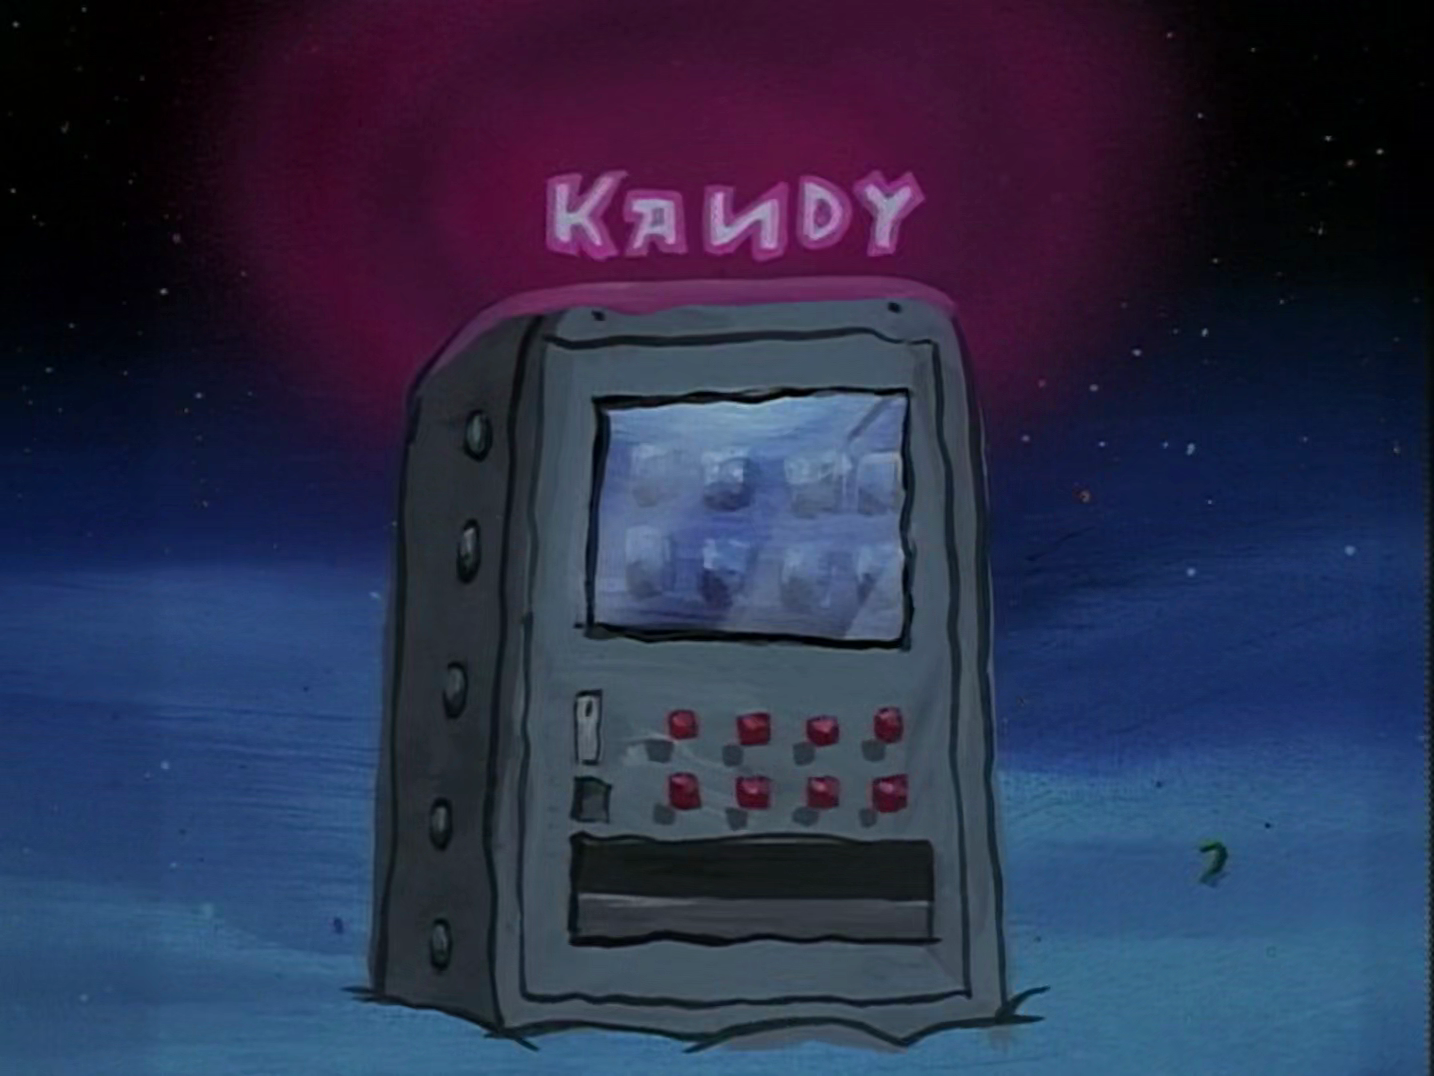 Kandy Machine